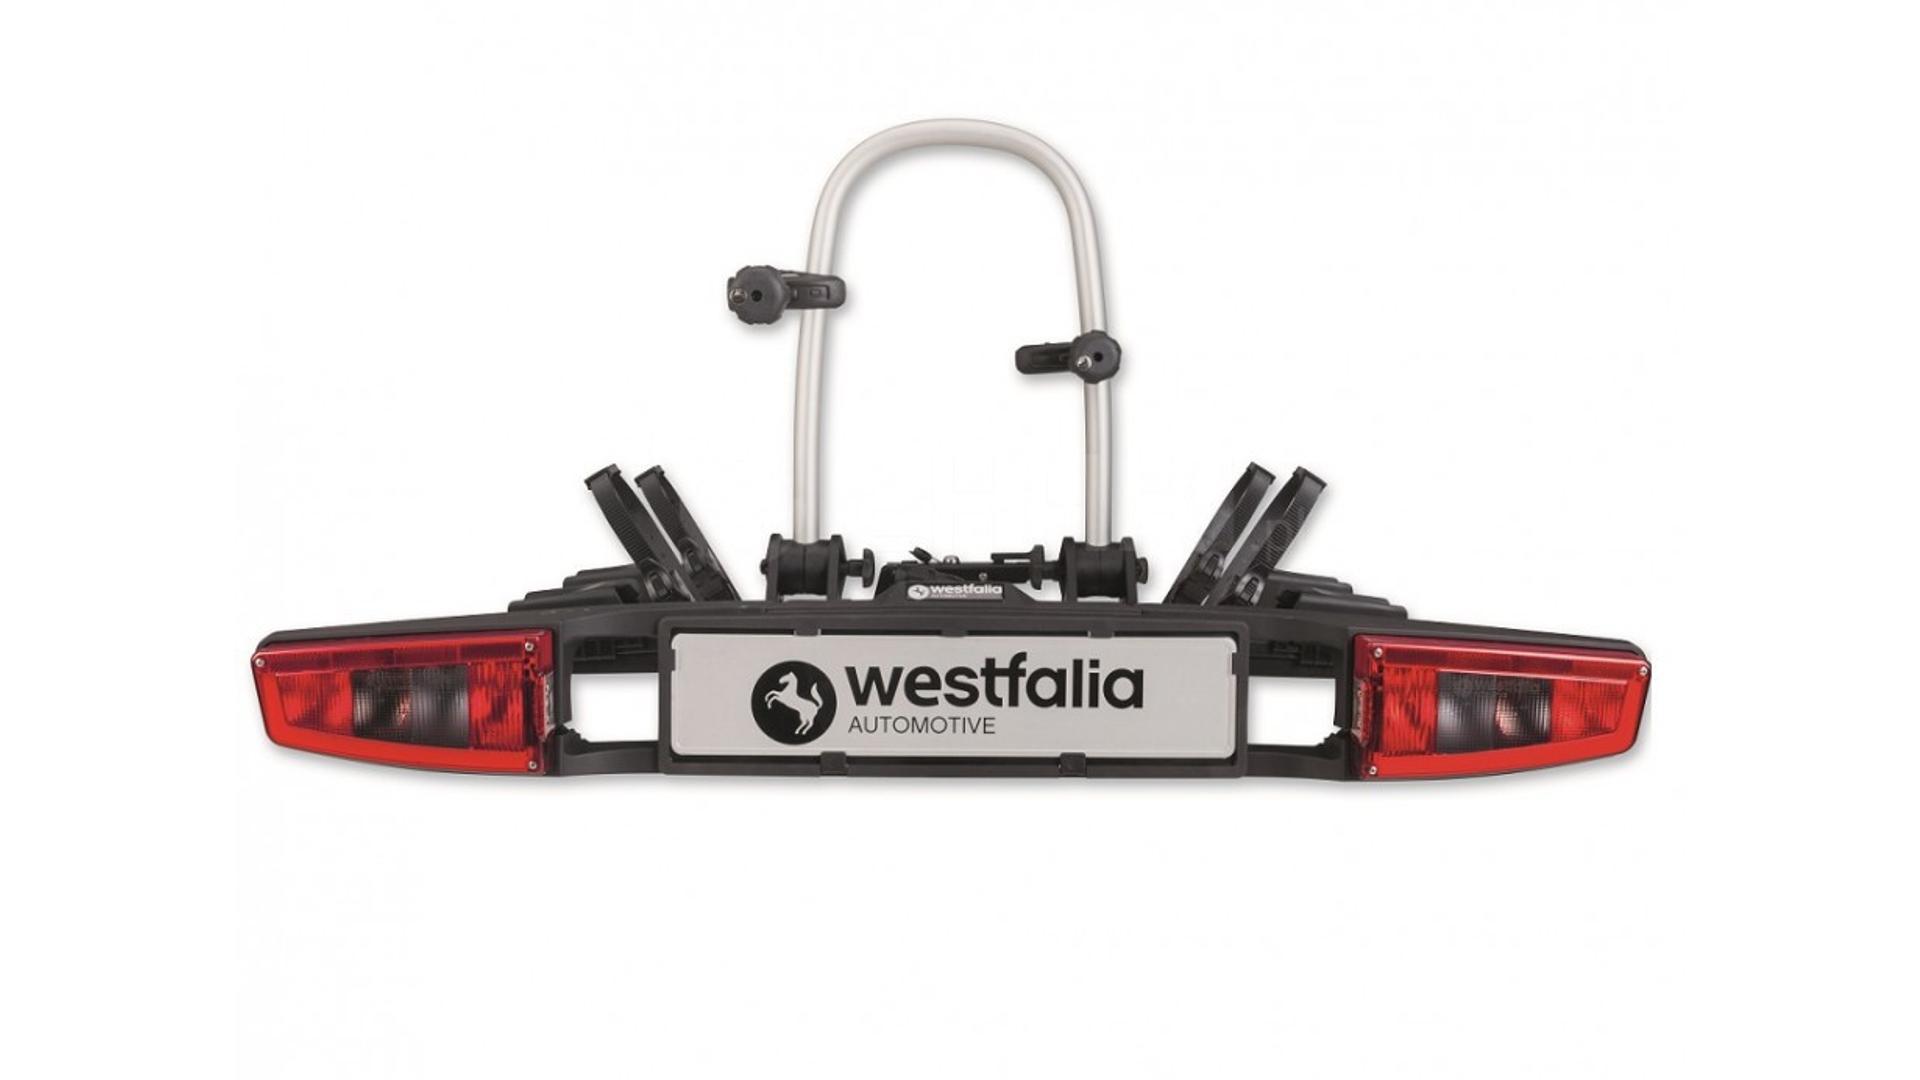 Westfalia BC 80 - nosič bicyklov na ťažné zariadenie (2 bicykle)